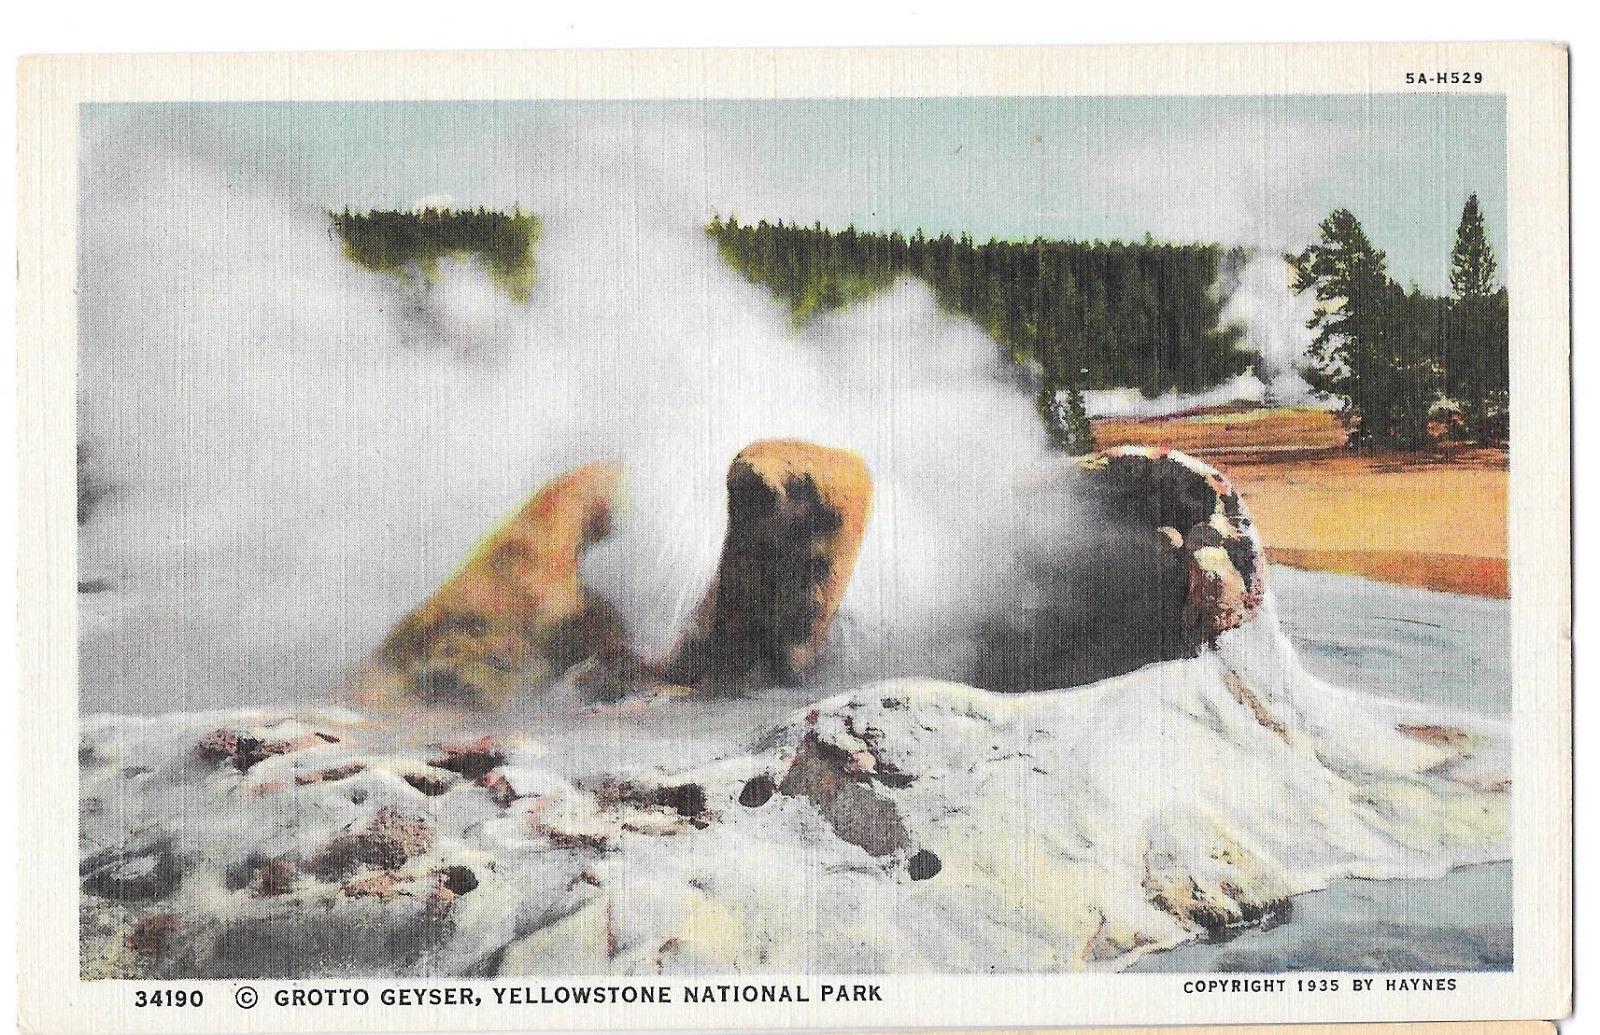 WY Yellowstone Park Grotto Geyser Vtg Haynes Linen Postcard Wyoming